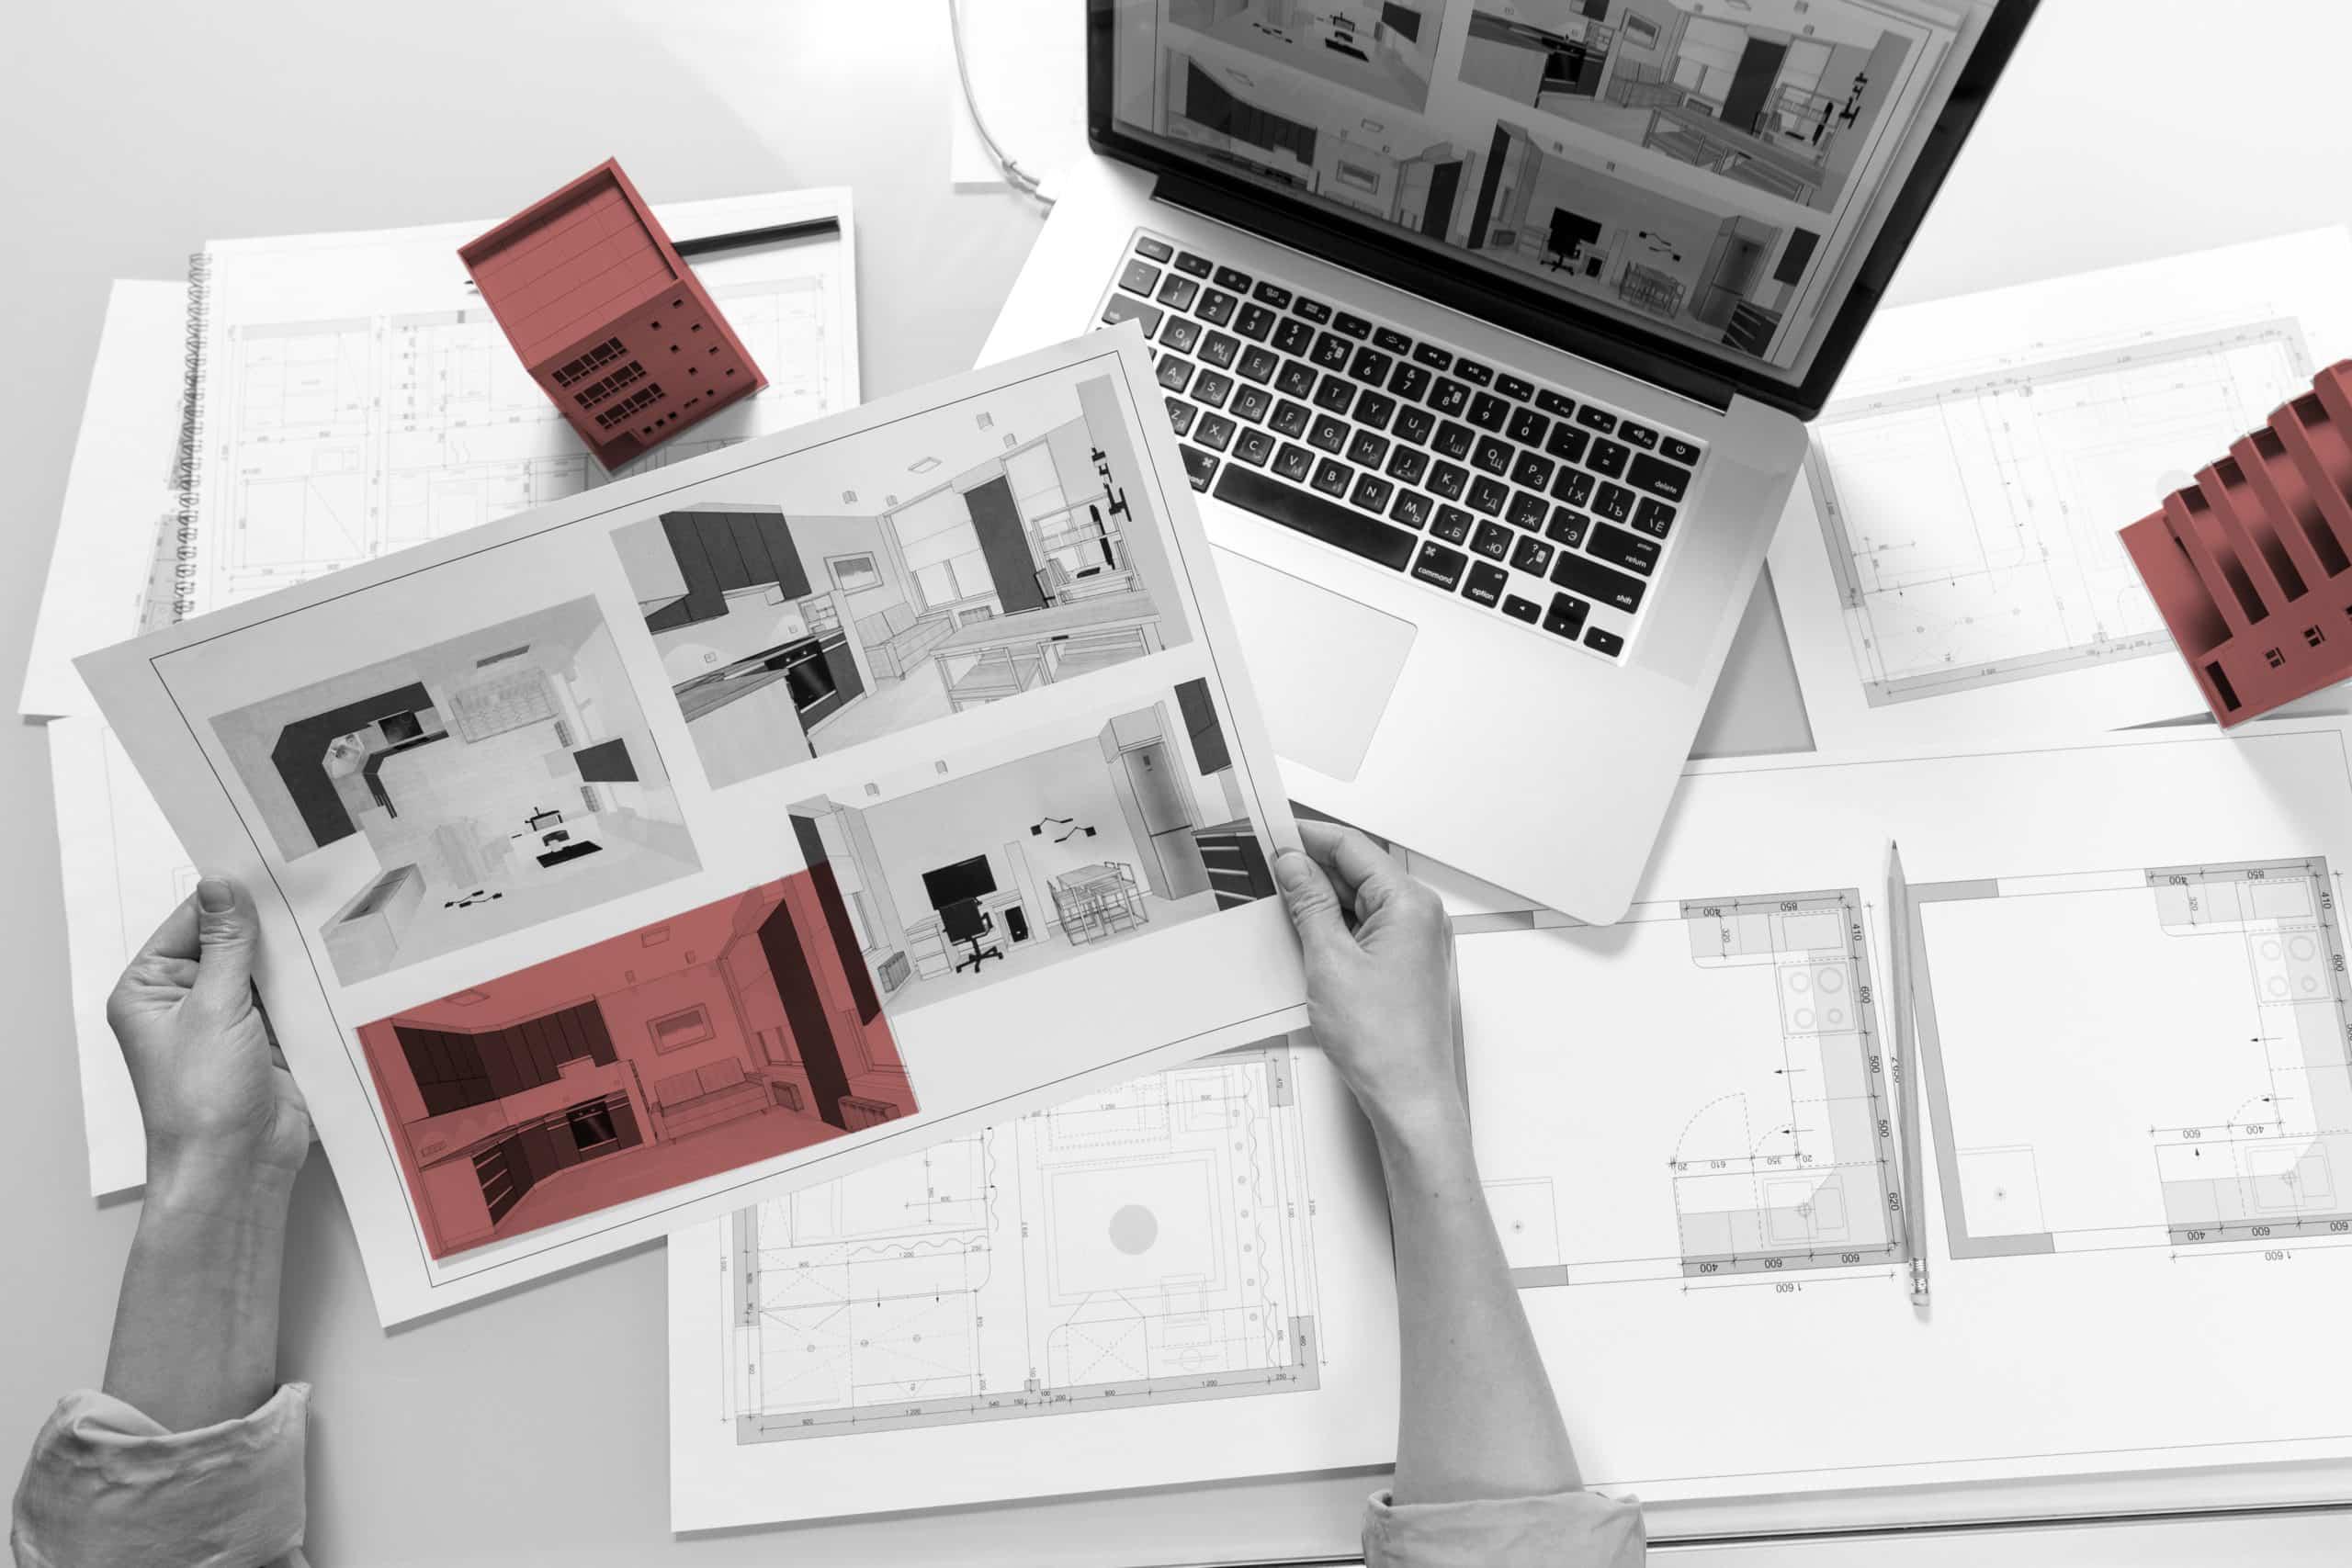 Architecture services New York City including schematic design, bidding and permits